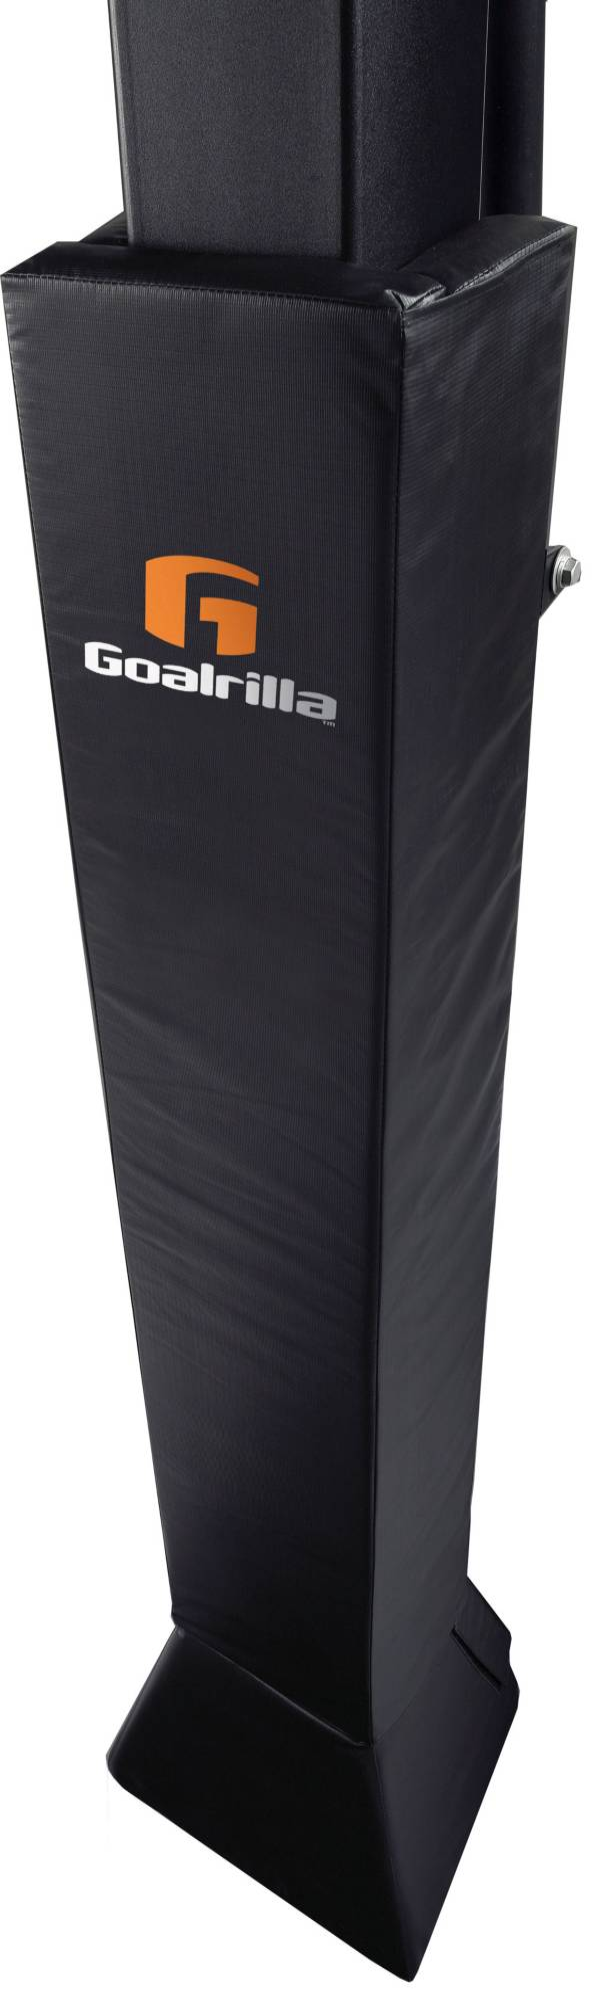 Goalrilla Universal Pole Pad product image